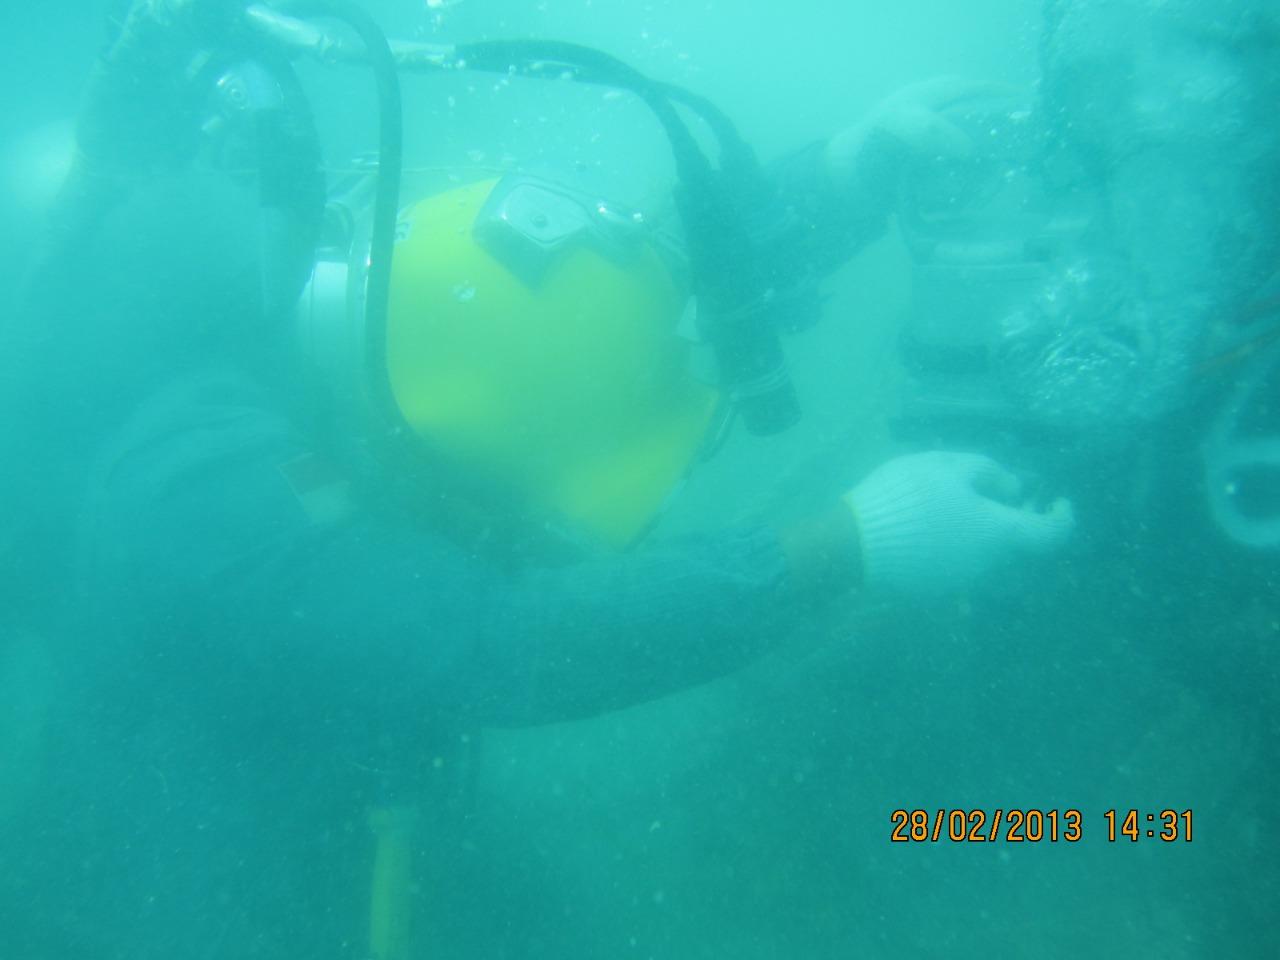 PT-Cakrawala-Amartha-Jaya-Oil-and-Gas-Underwater-Inspection-1